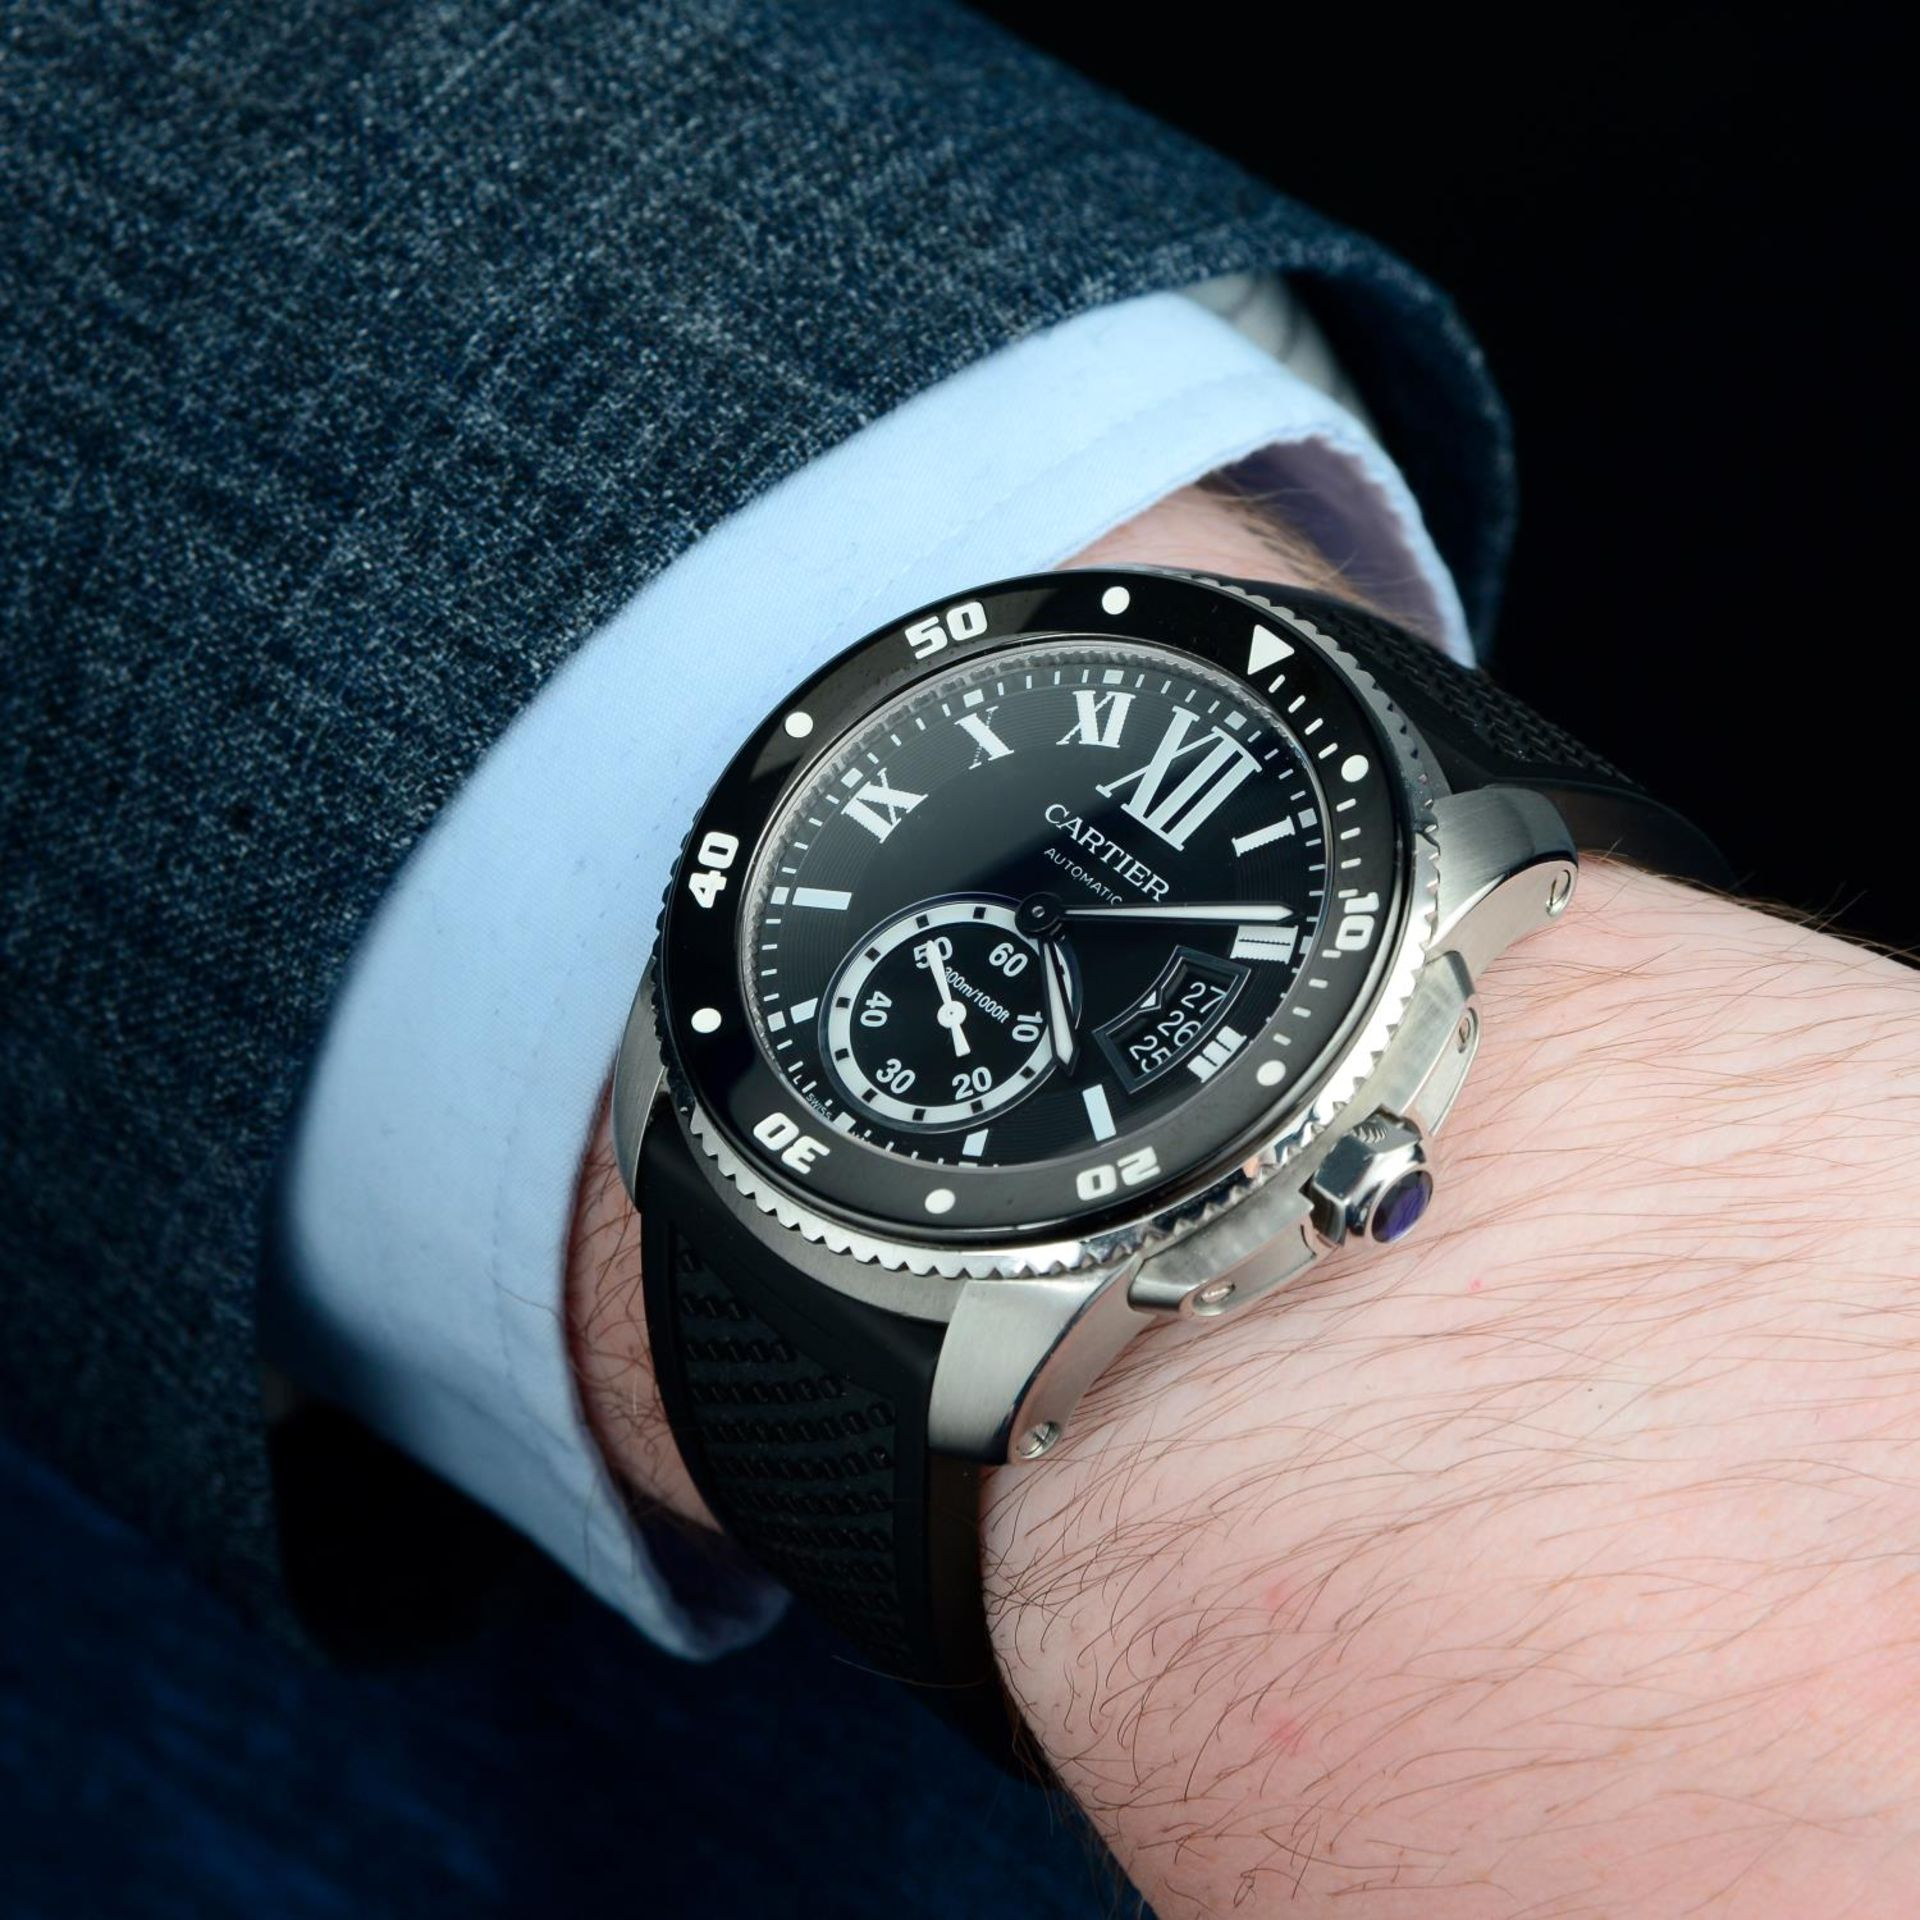 CARTIER - a Calibre de Cartier wrist watch. - Bild 3 aus 6